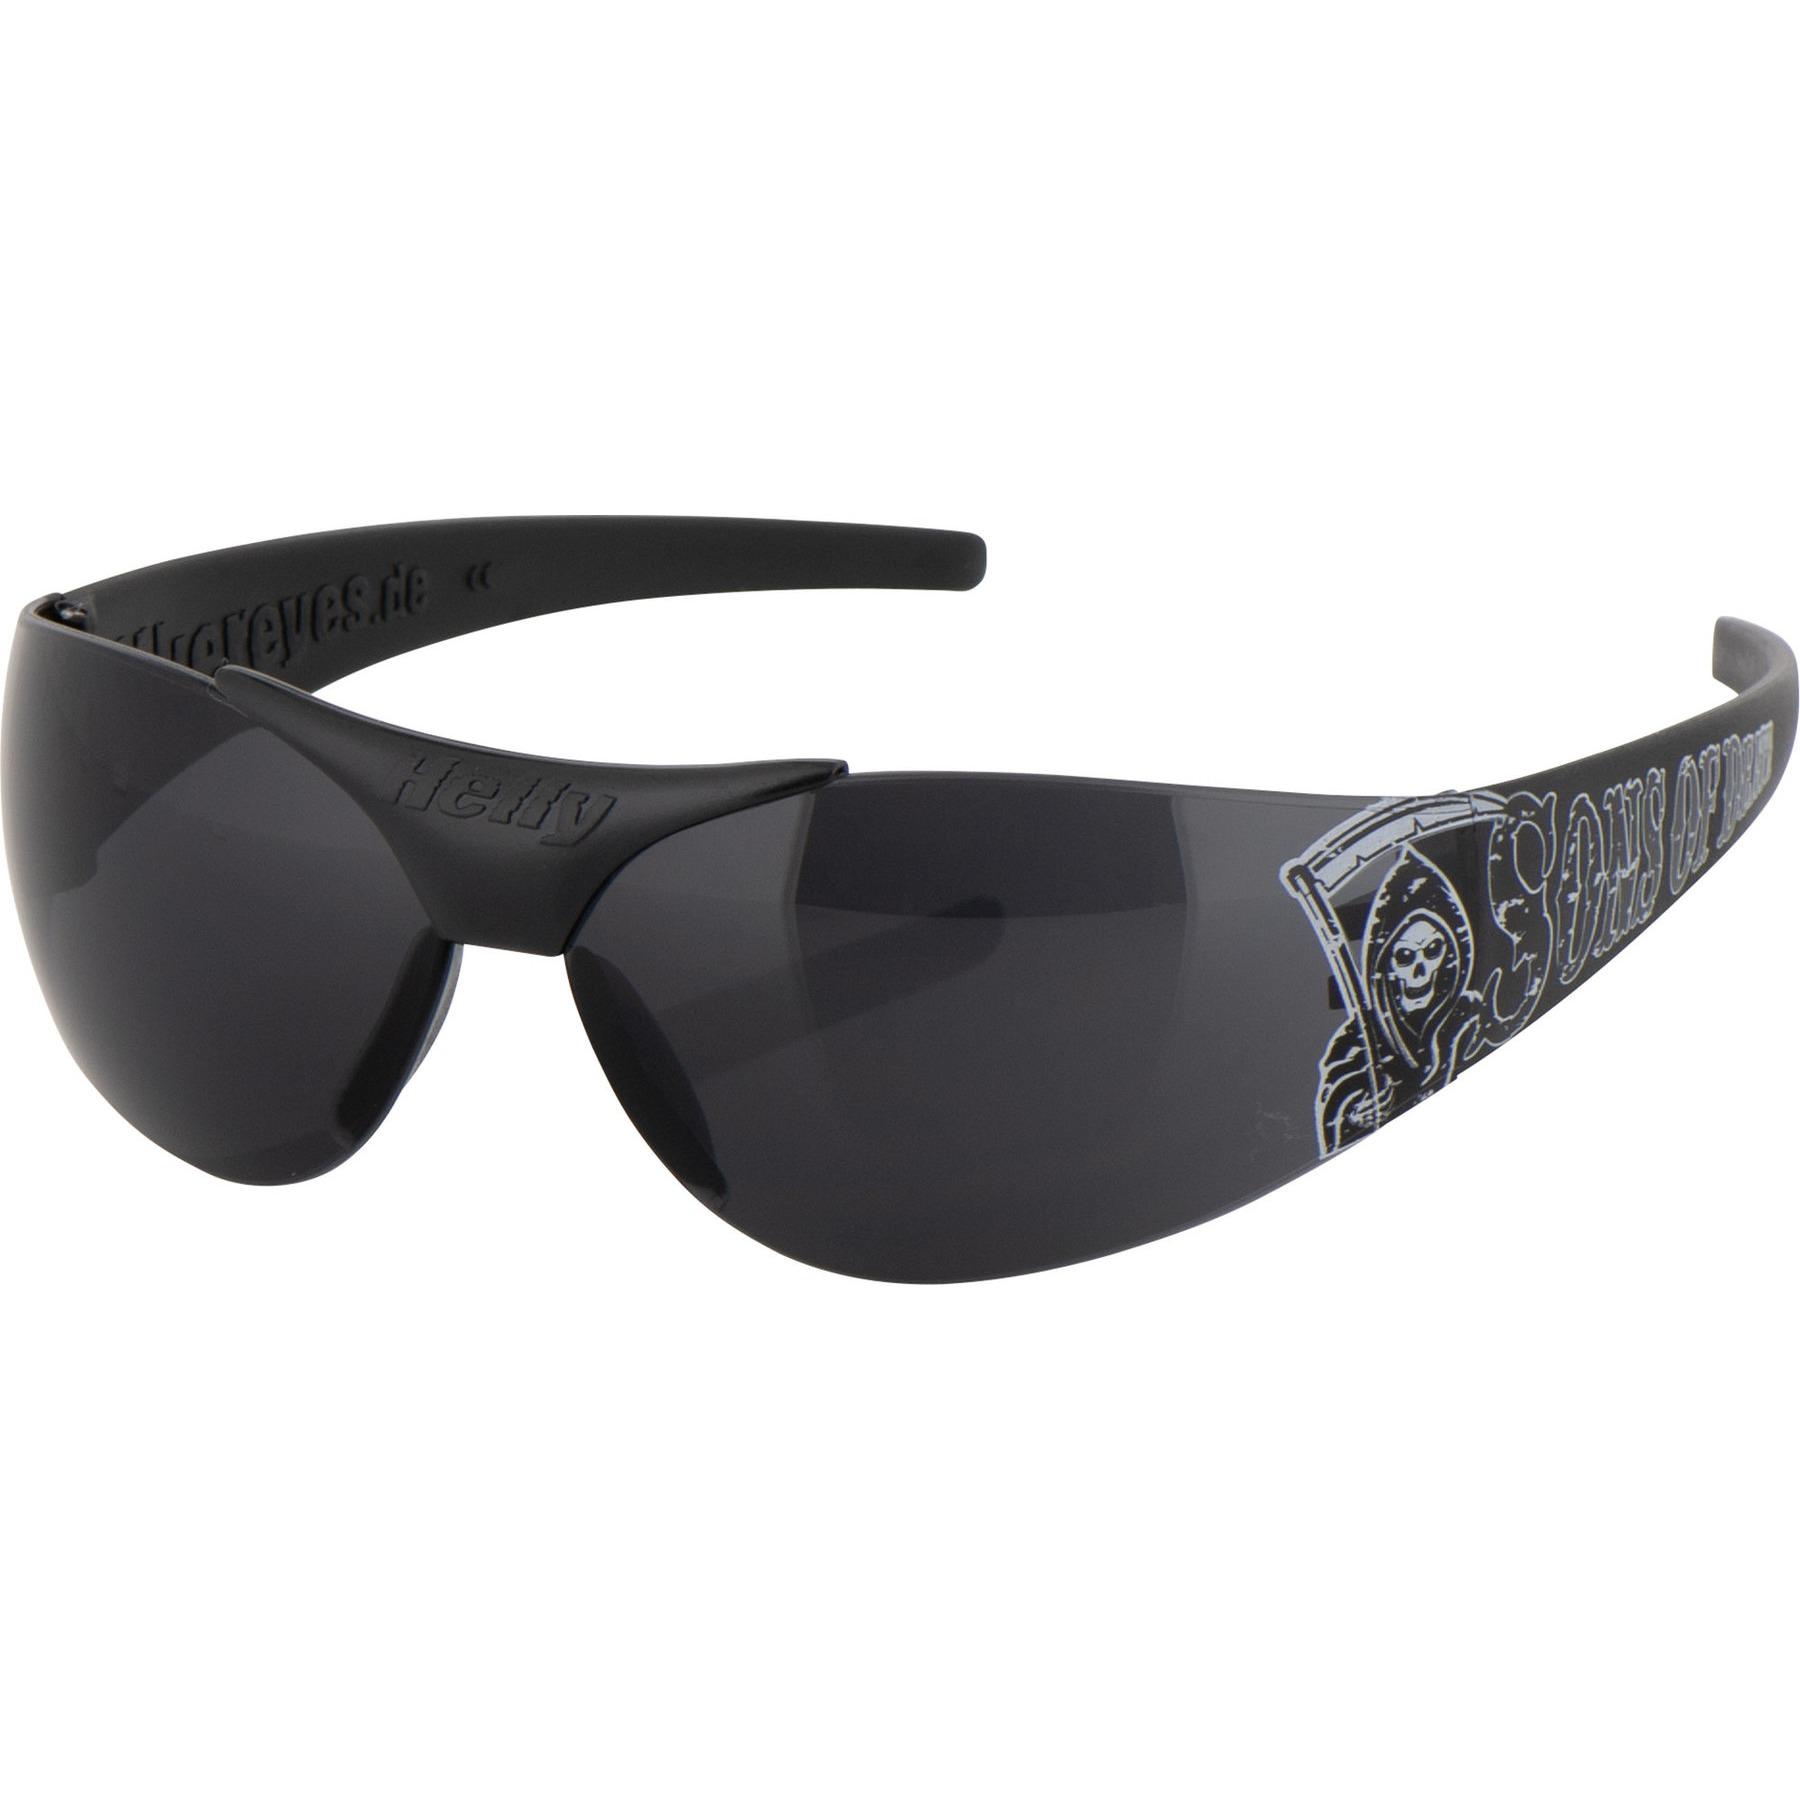 men // women motorcycle glasses motorcycle sunglasses antifog motorbike sunglasses shatterproof biker glasses windproof No.1 Bikereyes/® riding glasses Helly/® riding sunglasses